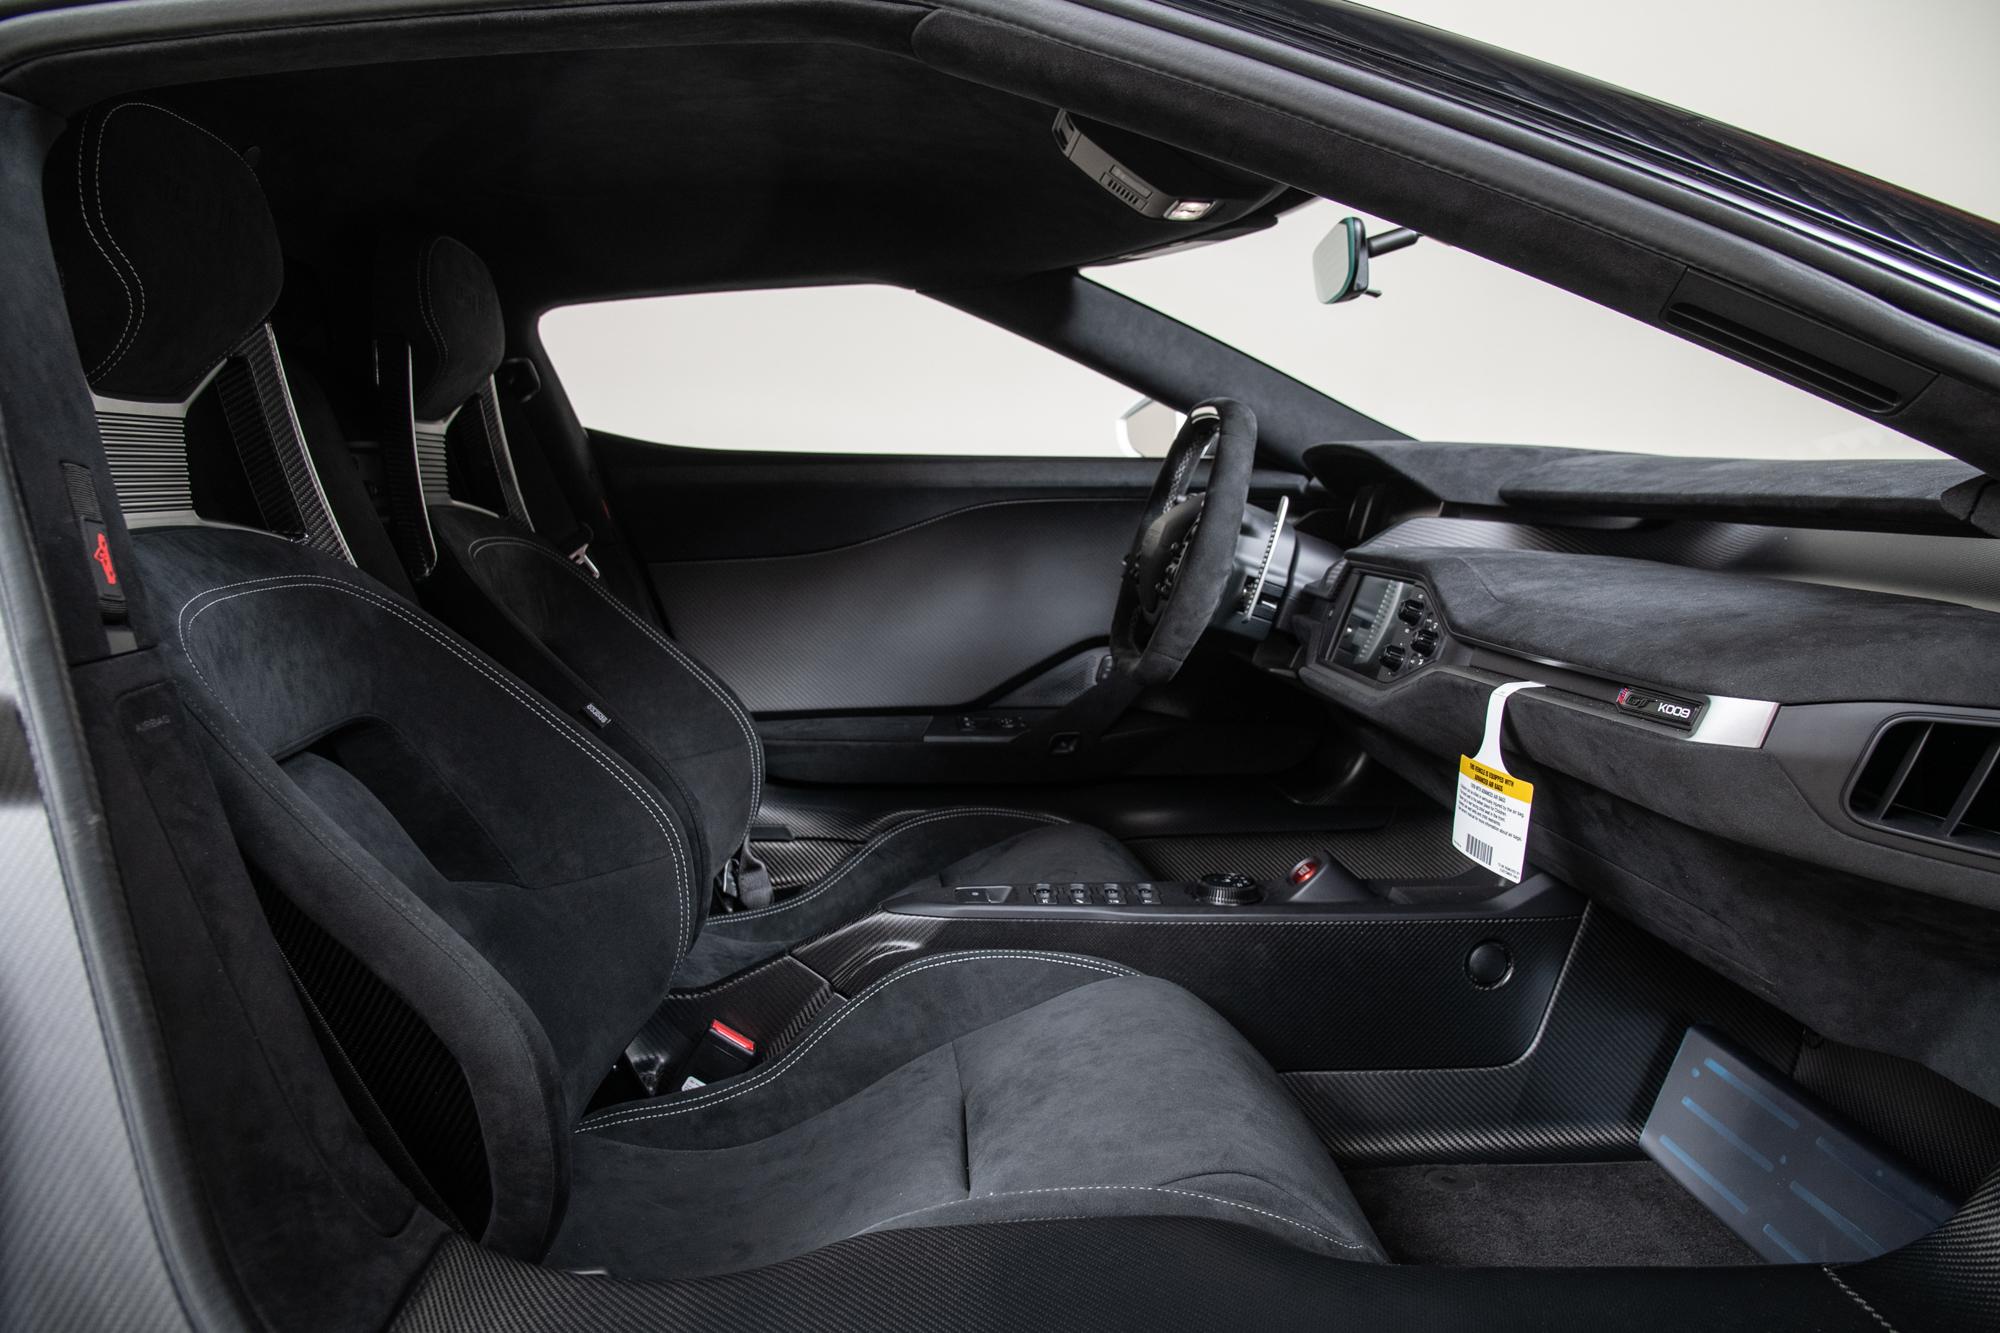 2019 Ford GT , WHITE, VIN 2FAGP9CW4KH200009, MILEAGE 44